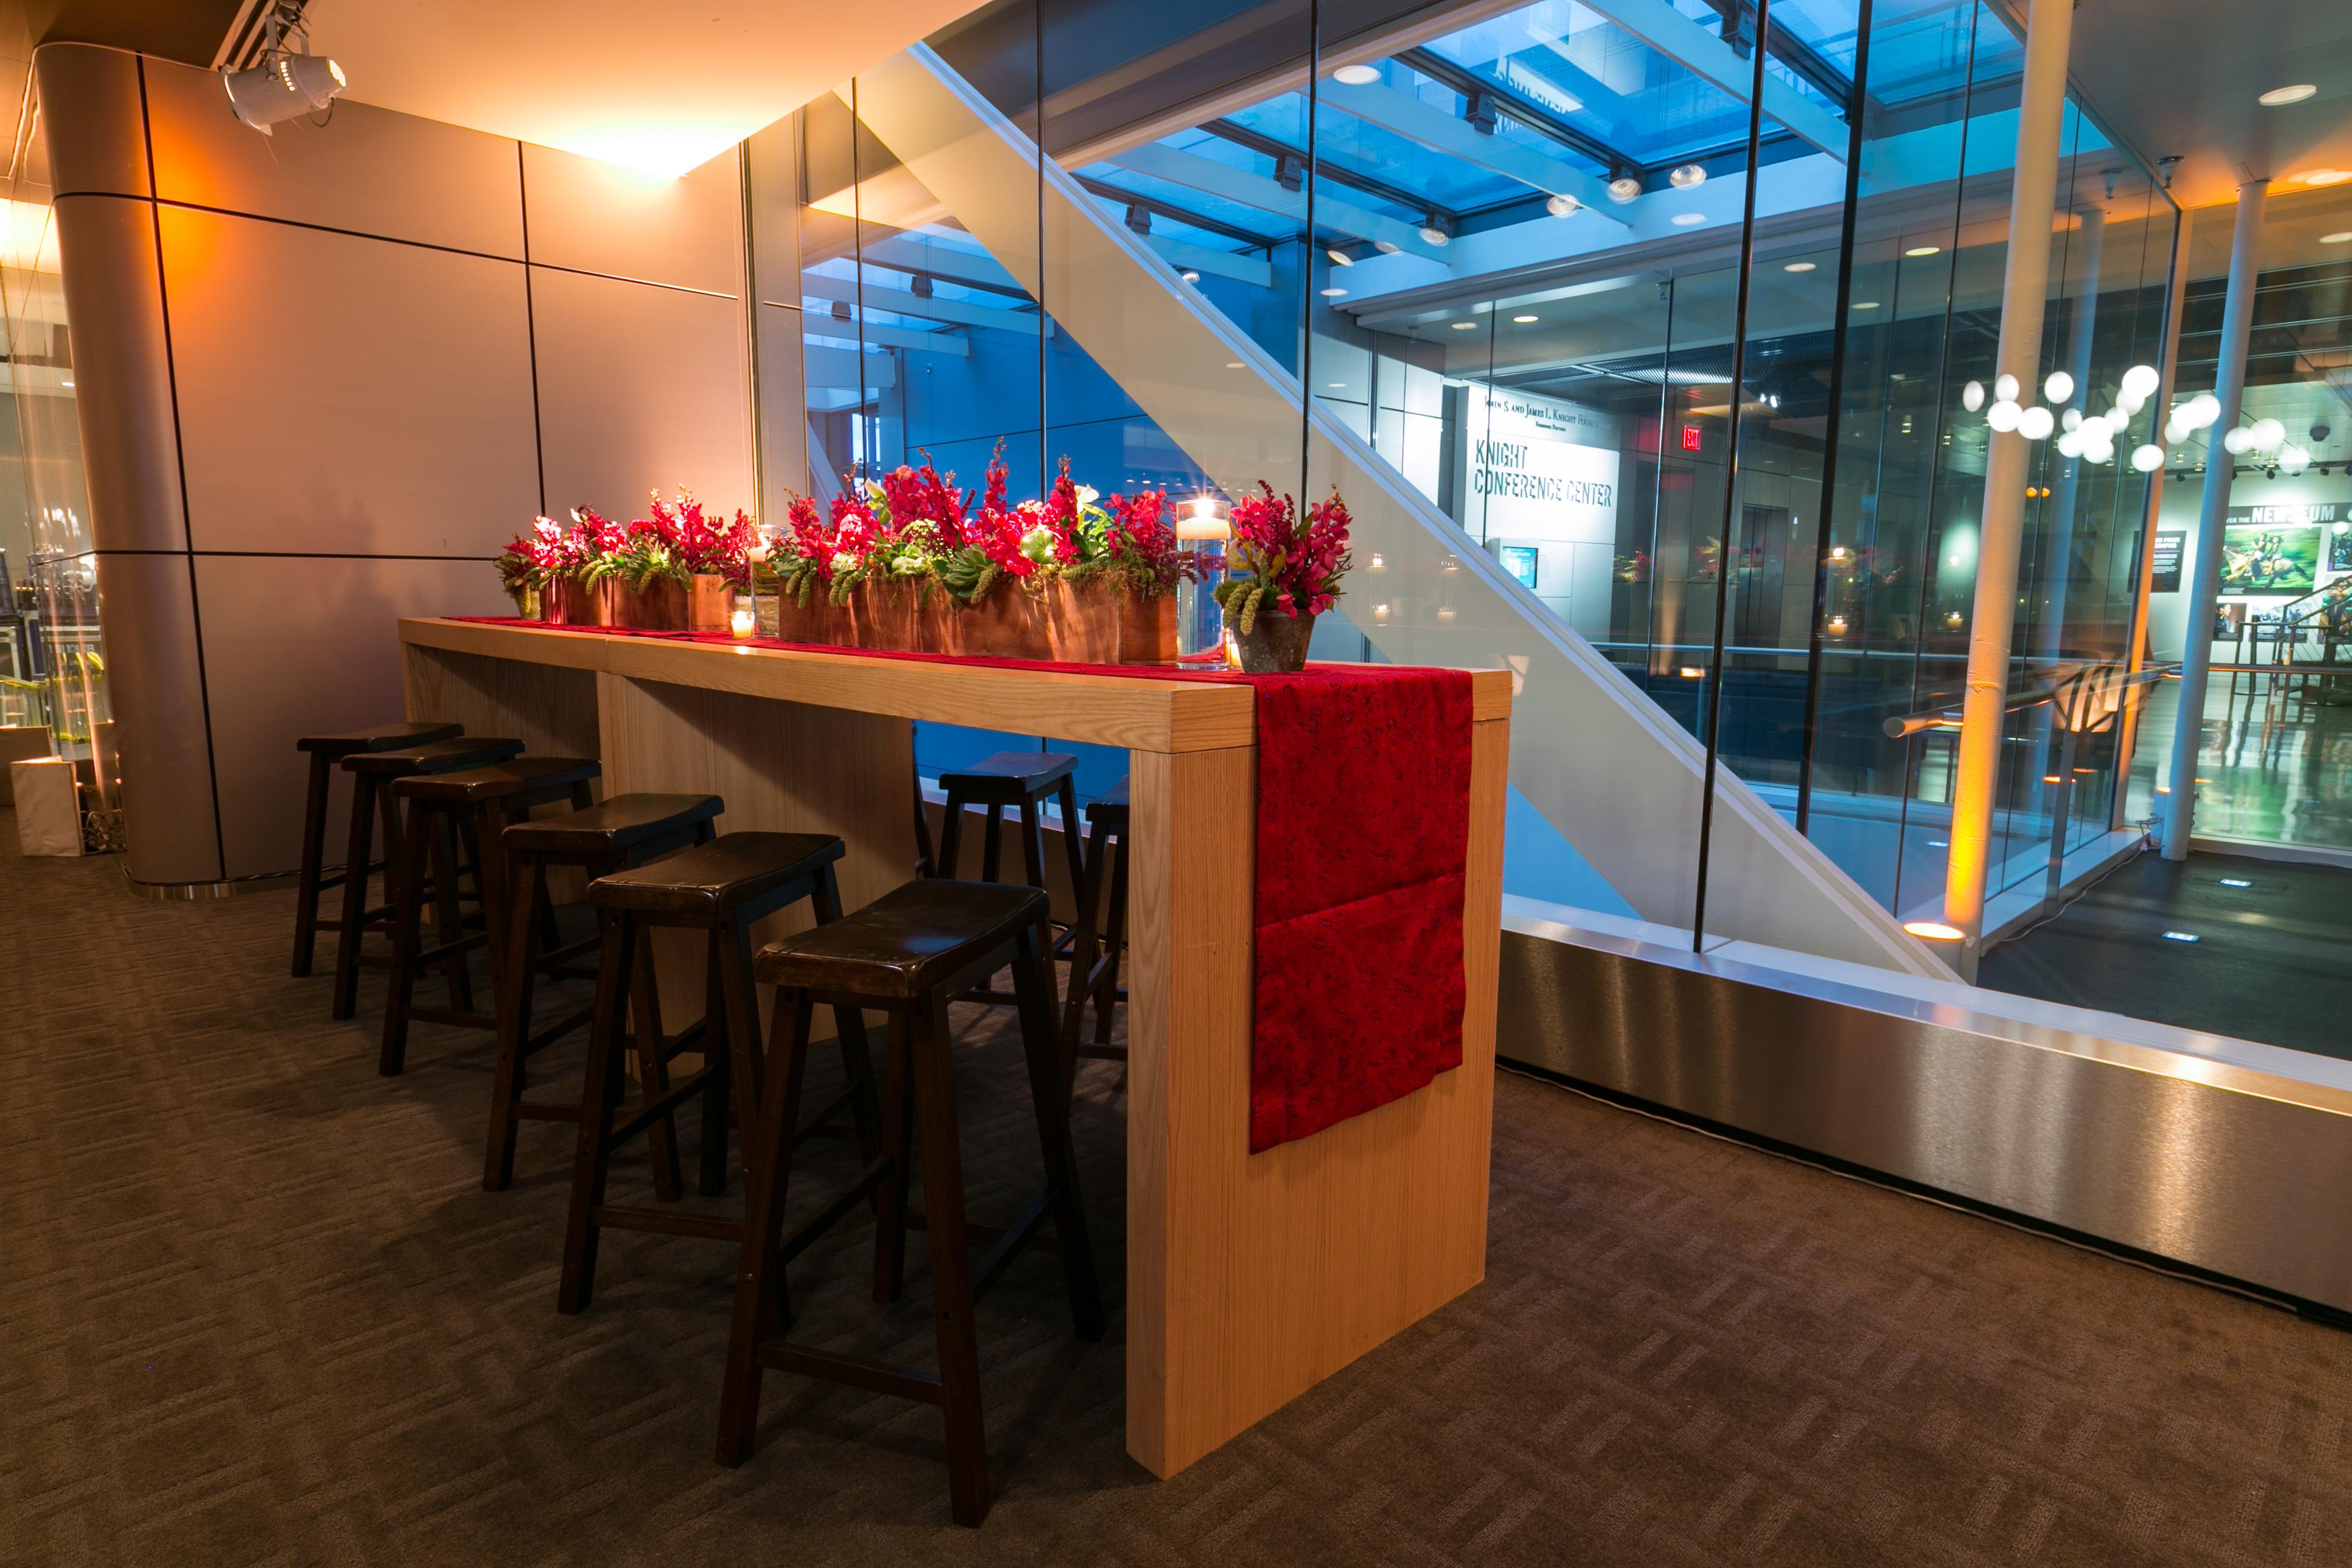 Red & Blue Baseball Theme Bar Mitzvah - Magnolia Bluebird design & events